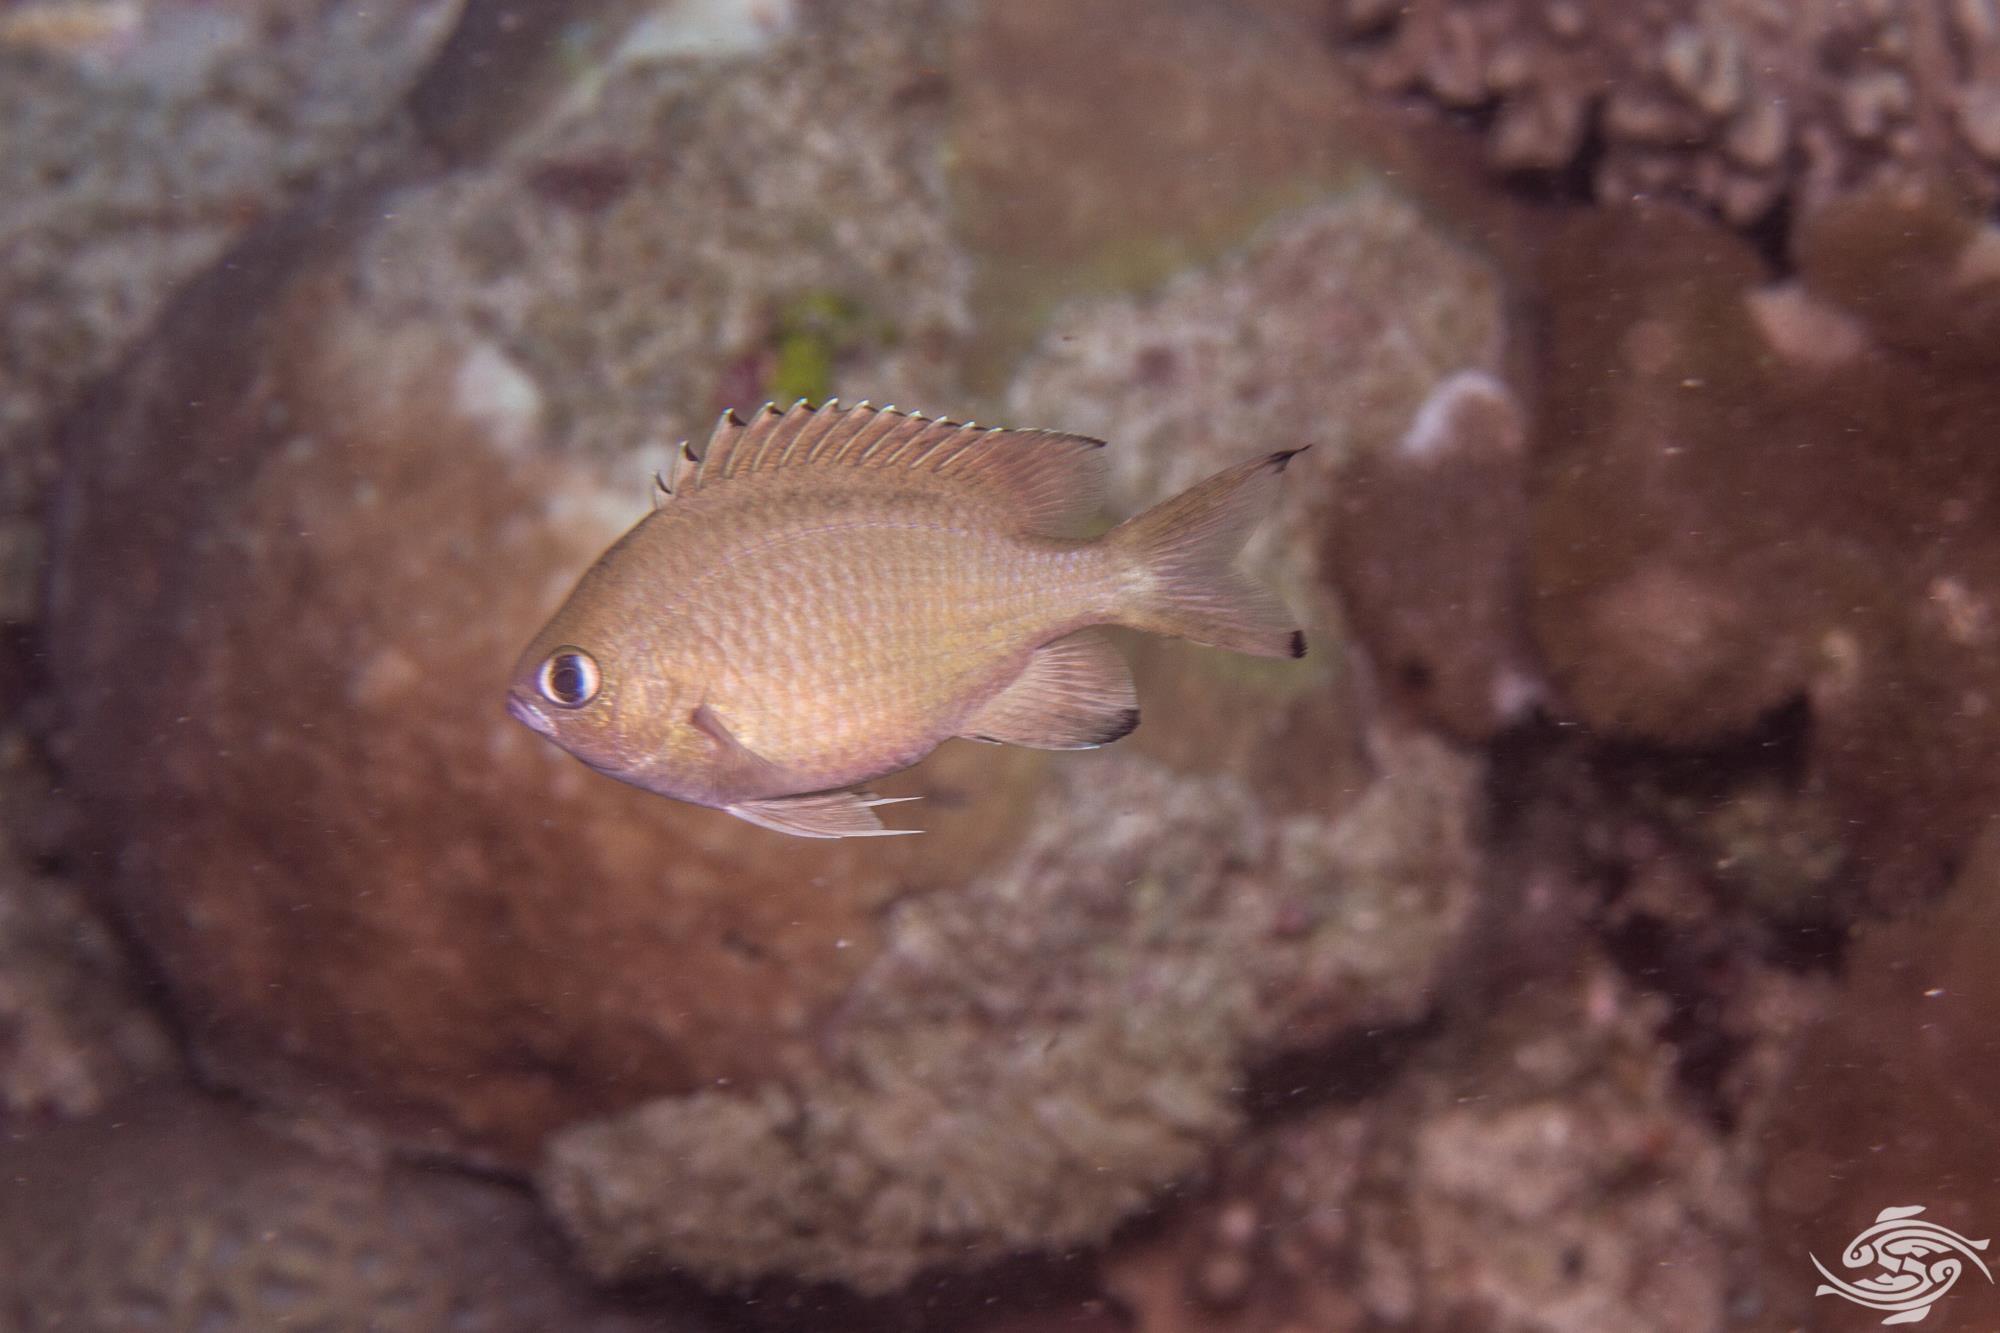 Scaly chromis (Chromis lepidolepis) is also known as the Brown Chromis